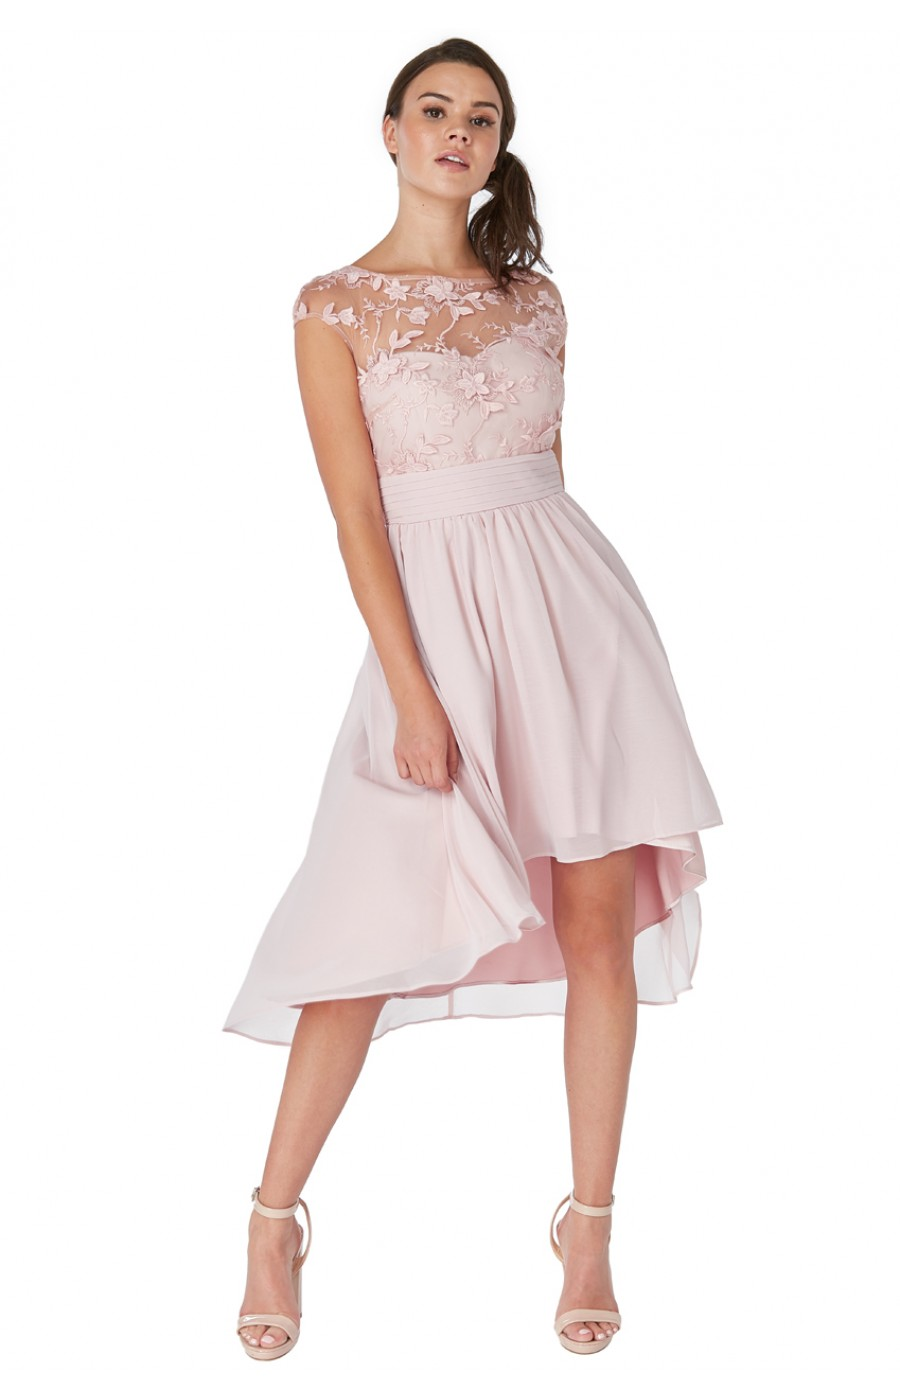 0afea68f51aa Μπεζ-ροζ σιφον, ασύμετρο φόρεμα με διαφάνεια και απλικέ λουλούδια